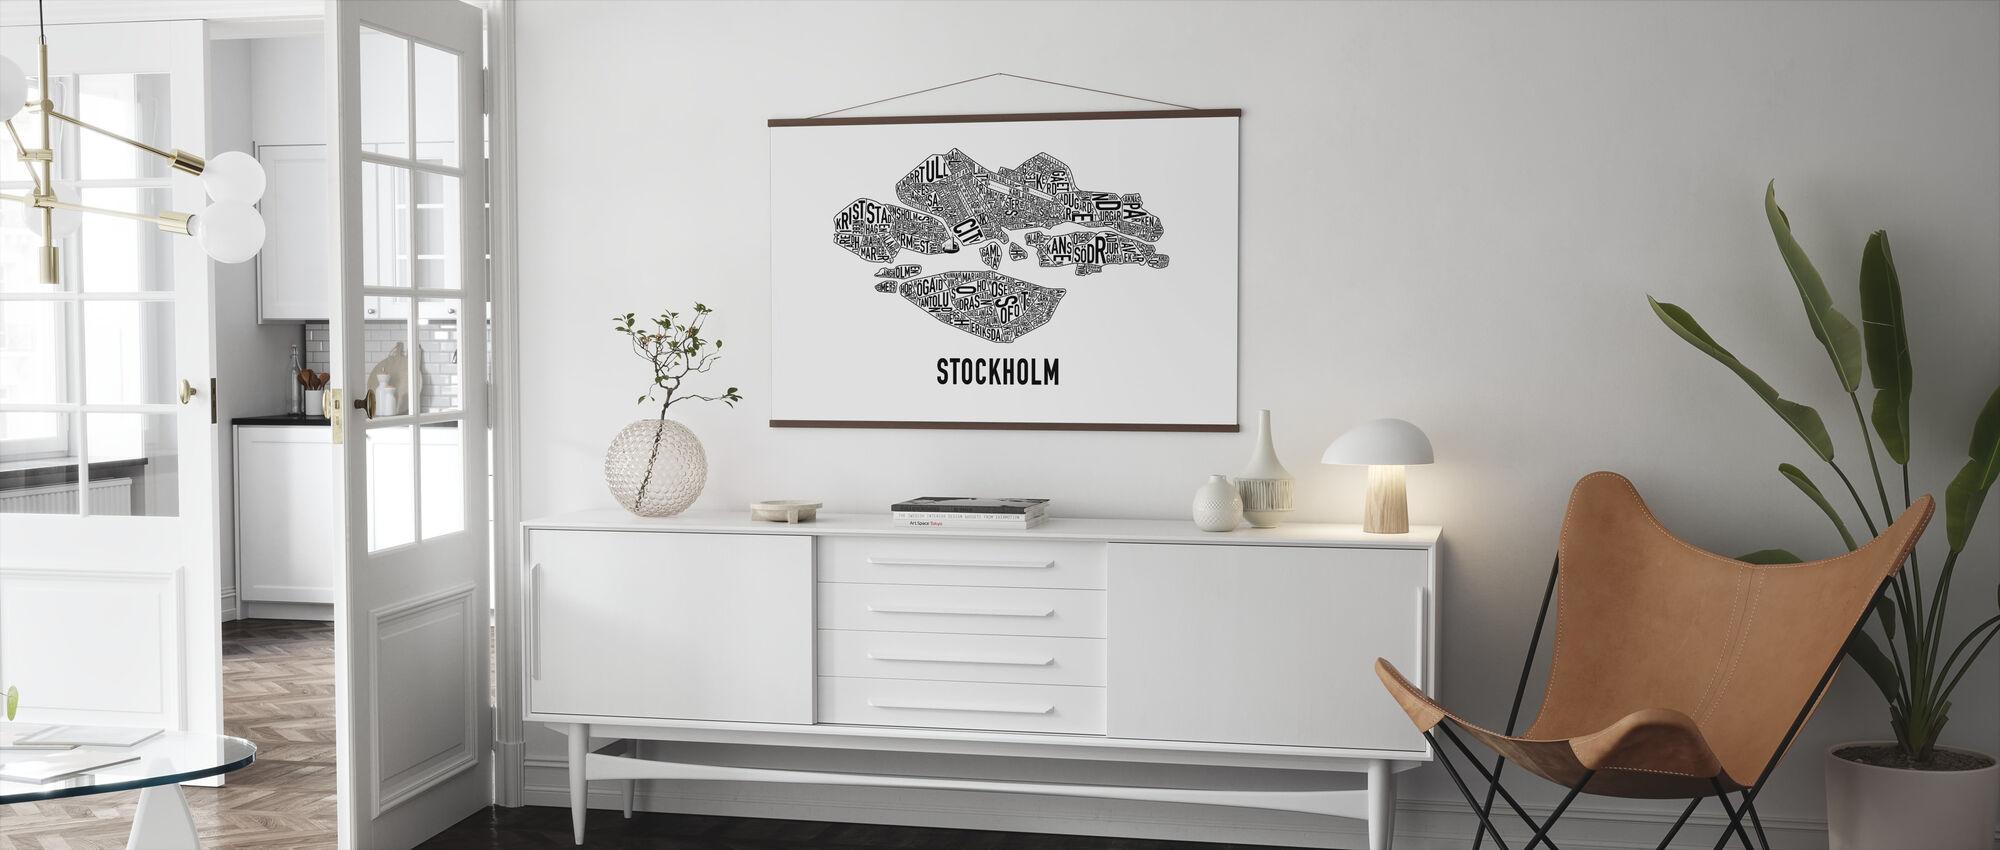 Stockholm - Poster - Vardagsrum